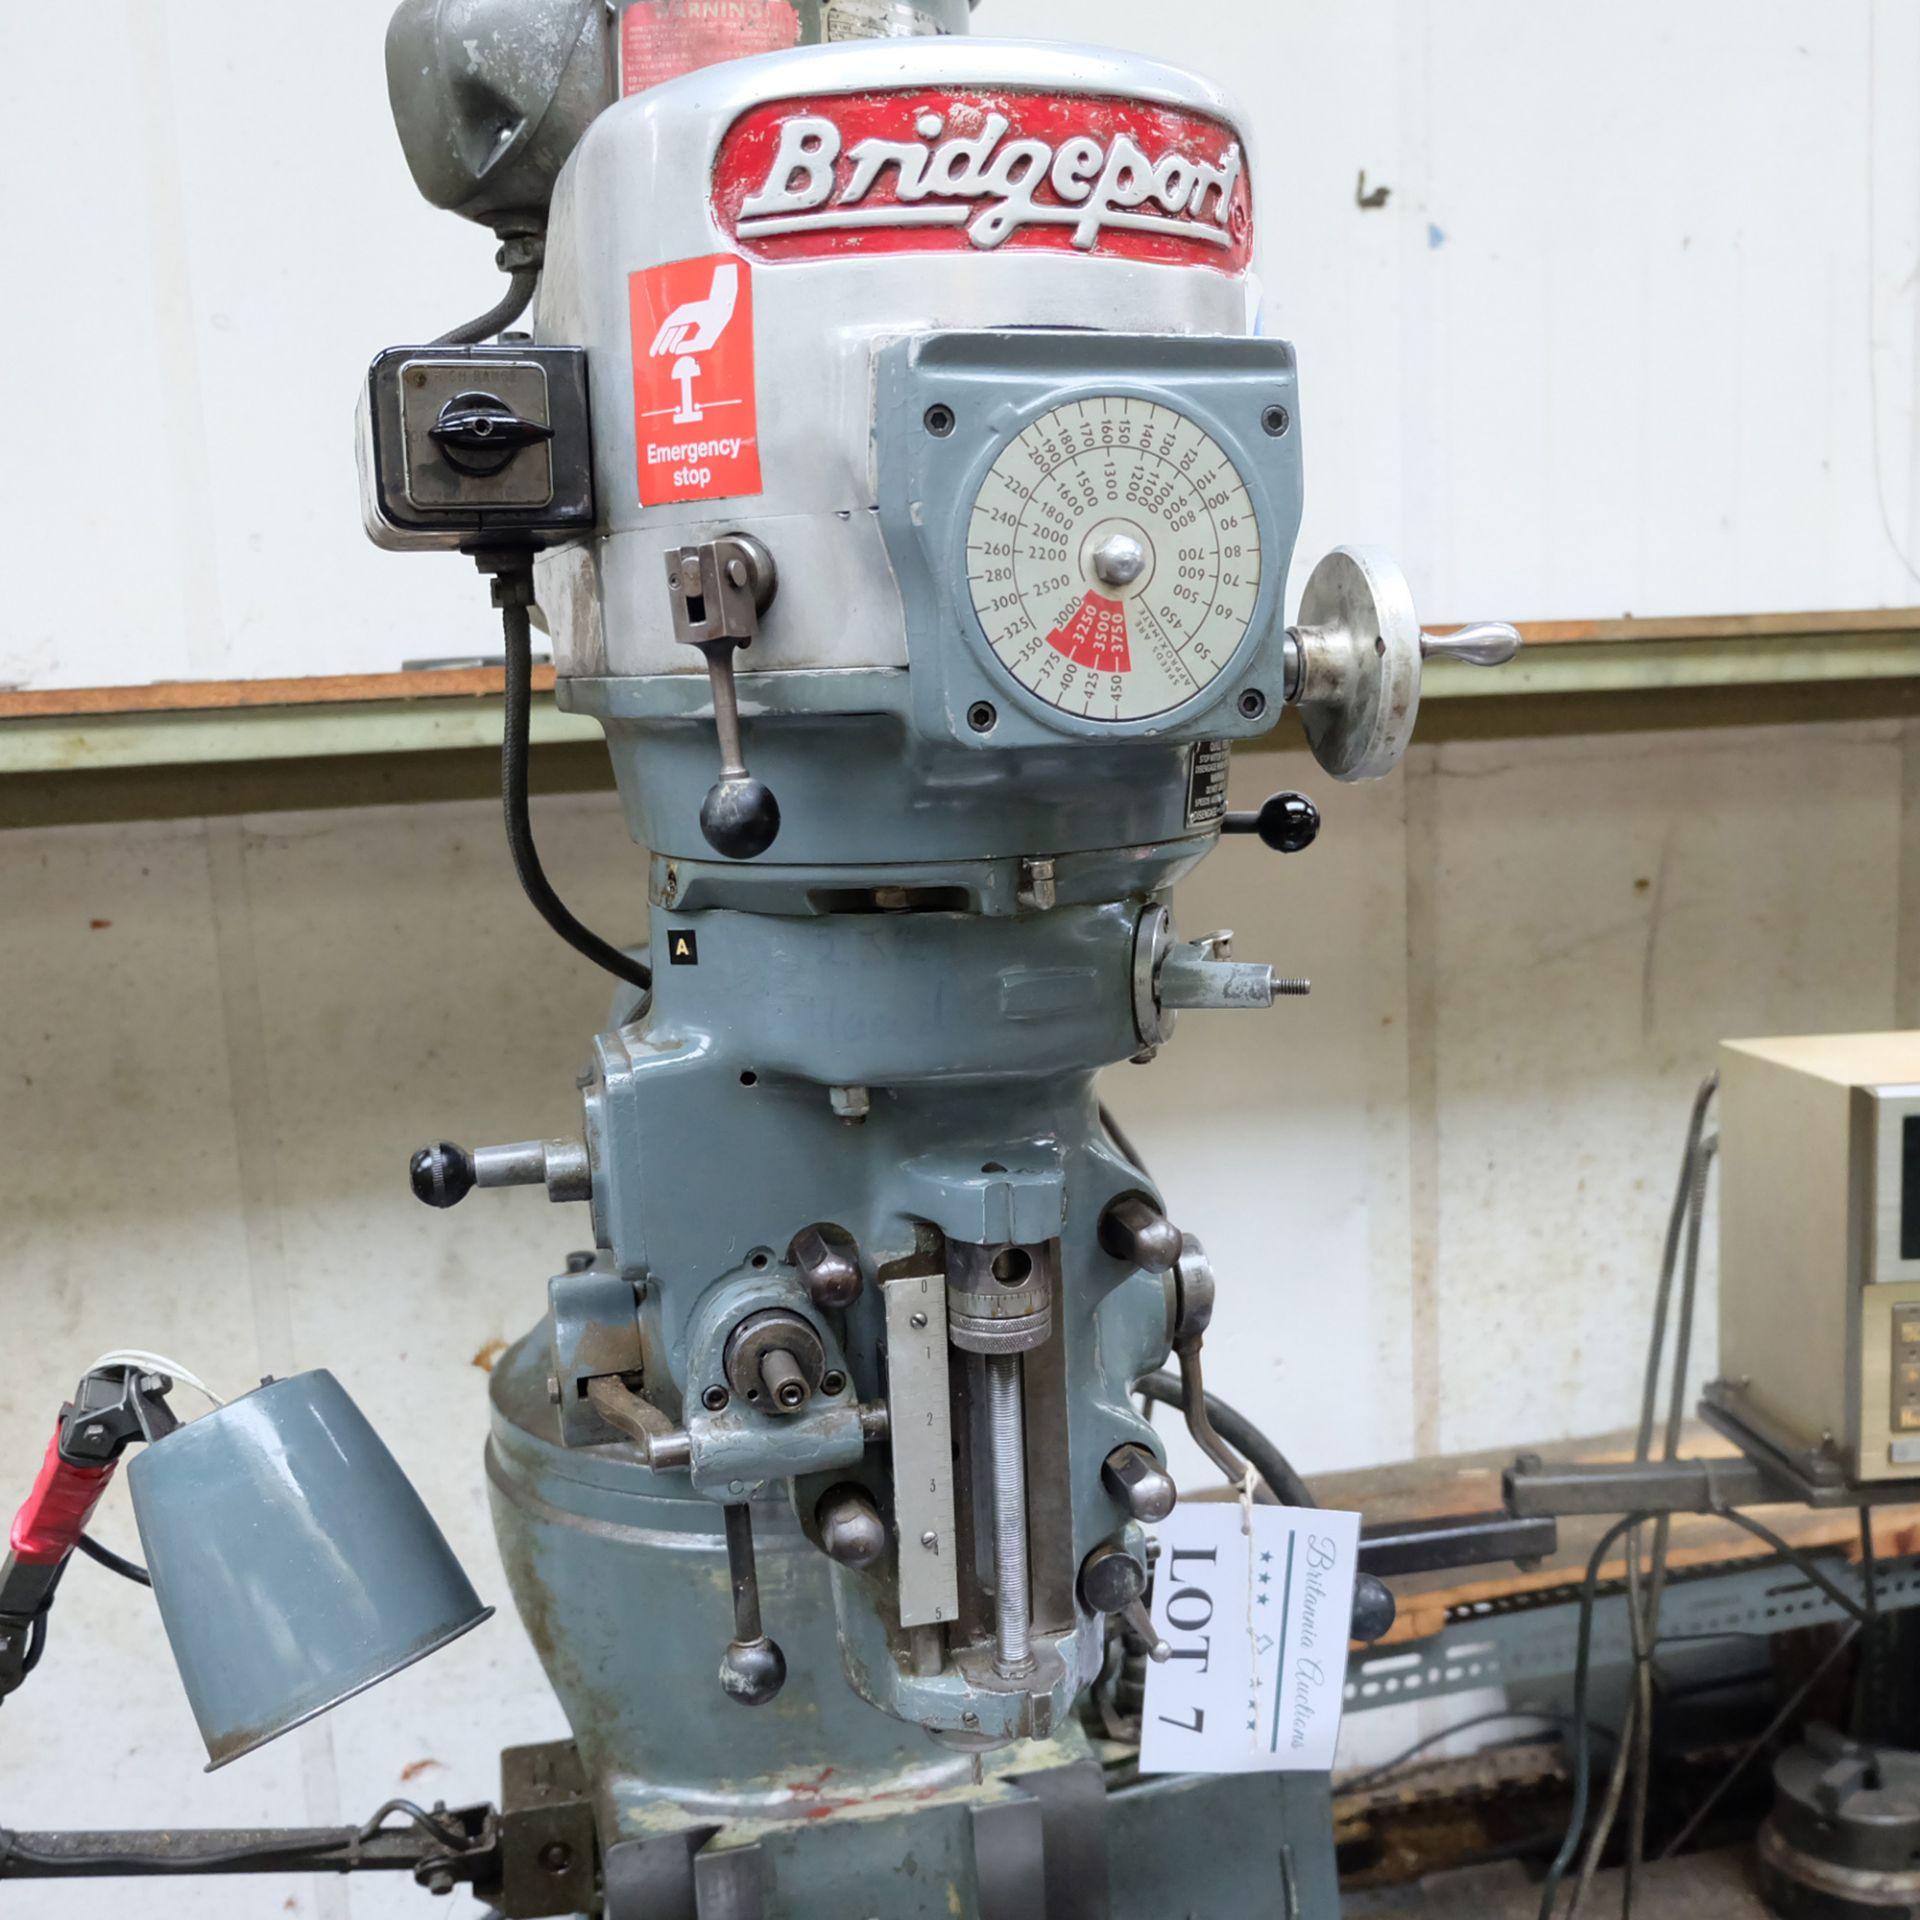 Bridgeport BR2J Variable Speed Head Turret Milling Machine. - Image 3 of 7